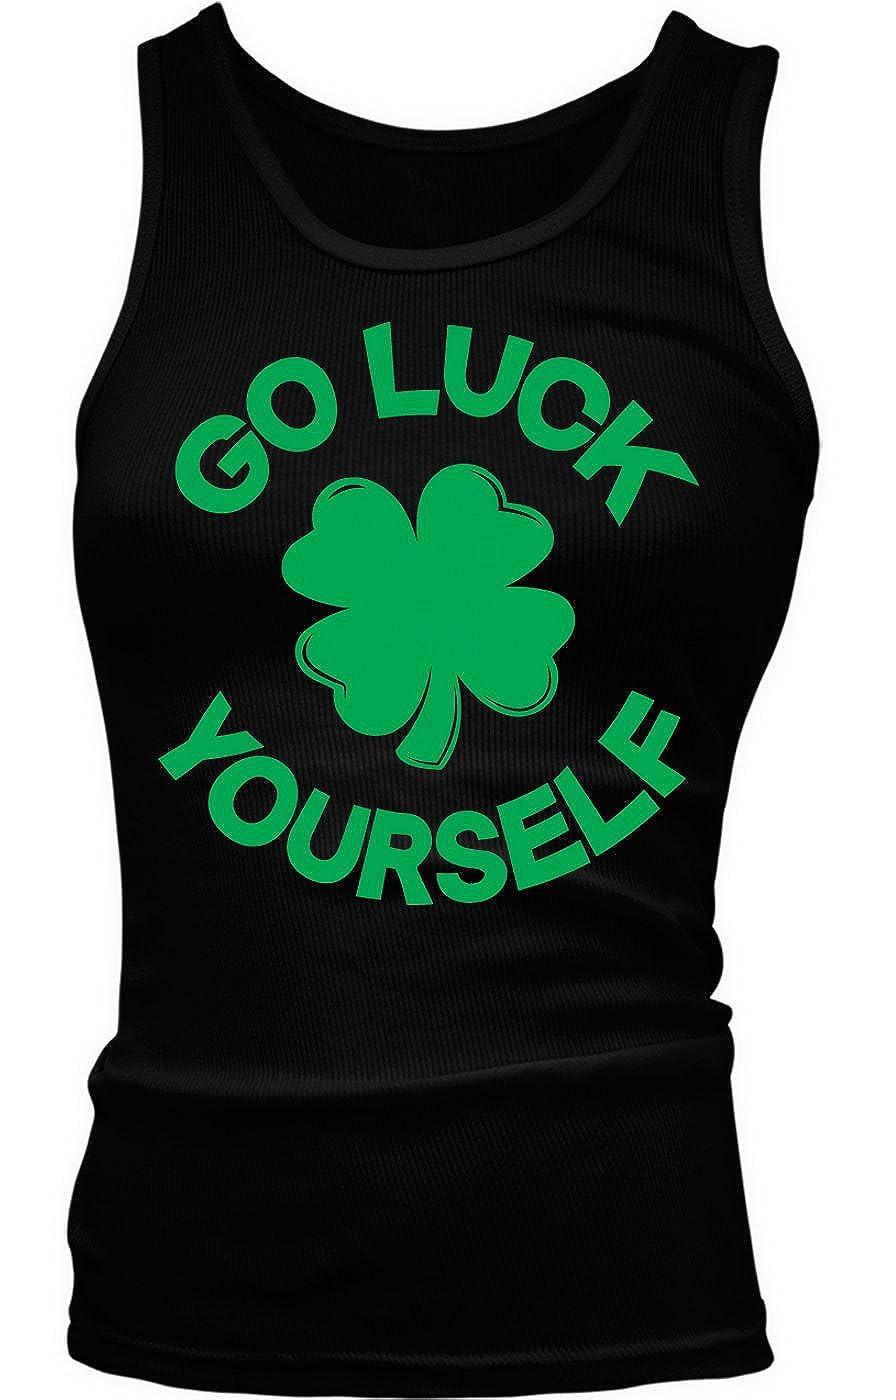 Tcombo Good Luck Yourself - Green Shamrock - ST Patricks Day Girls/Juniors Tank Top T-Shirt